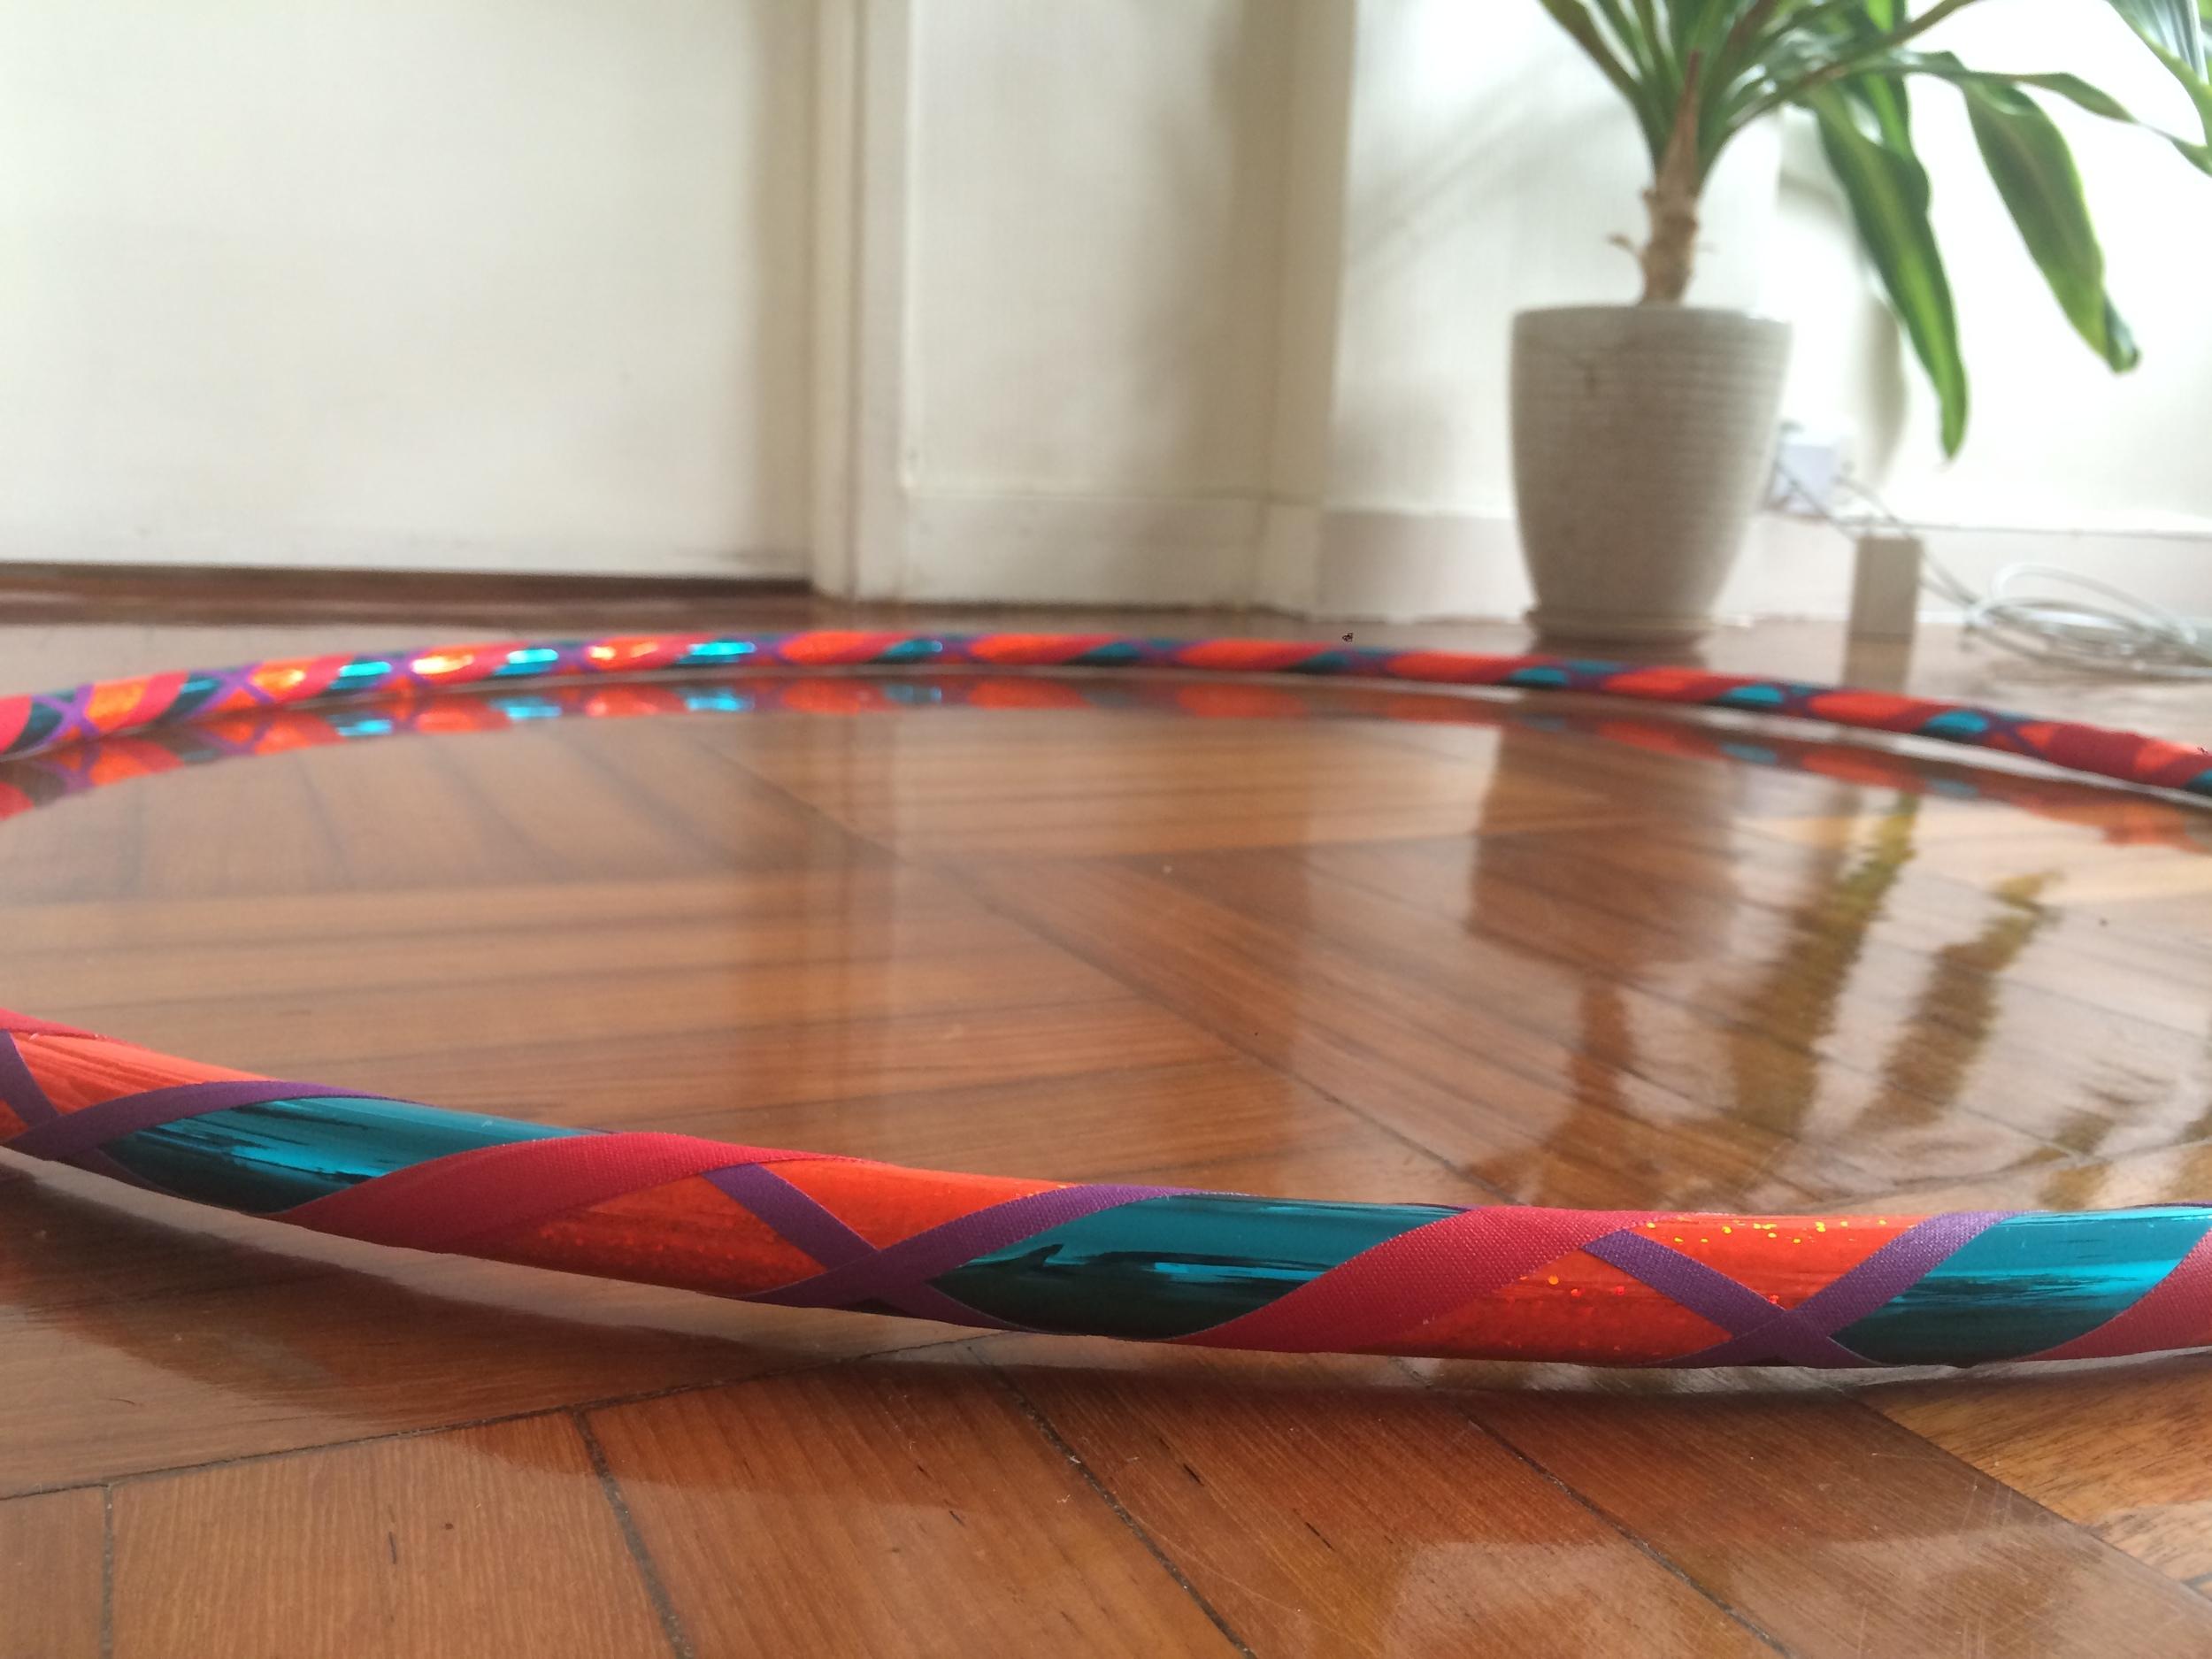 buy a hula hoop hong kong 香港自定呼啦圈